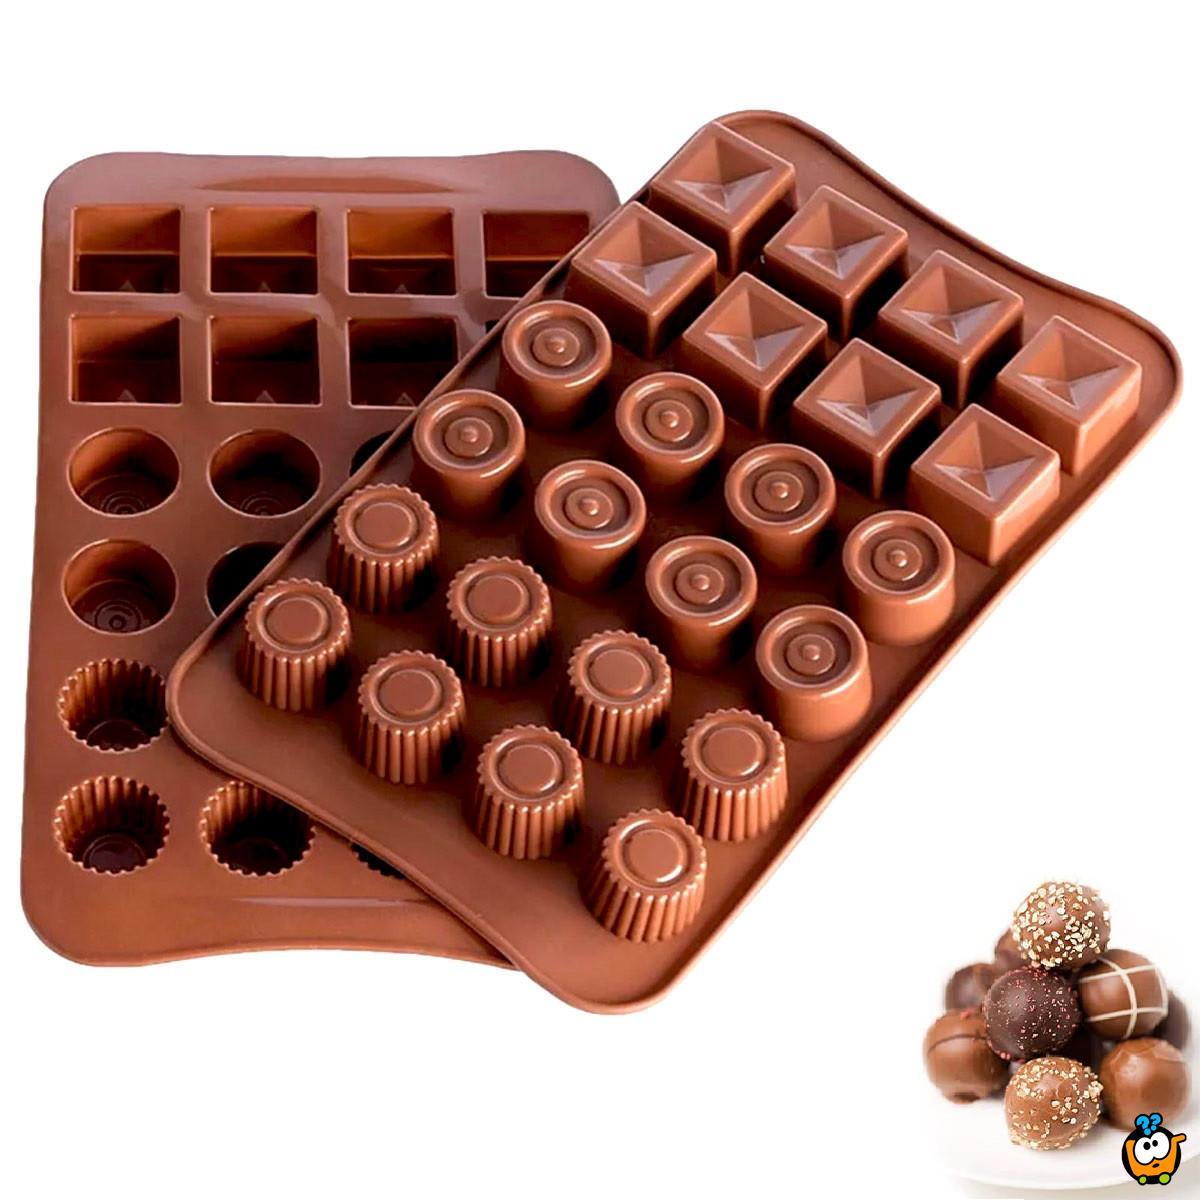 3D Chocolate Bombons - Silikonski kalup za pravljenje bombonjera